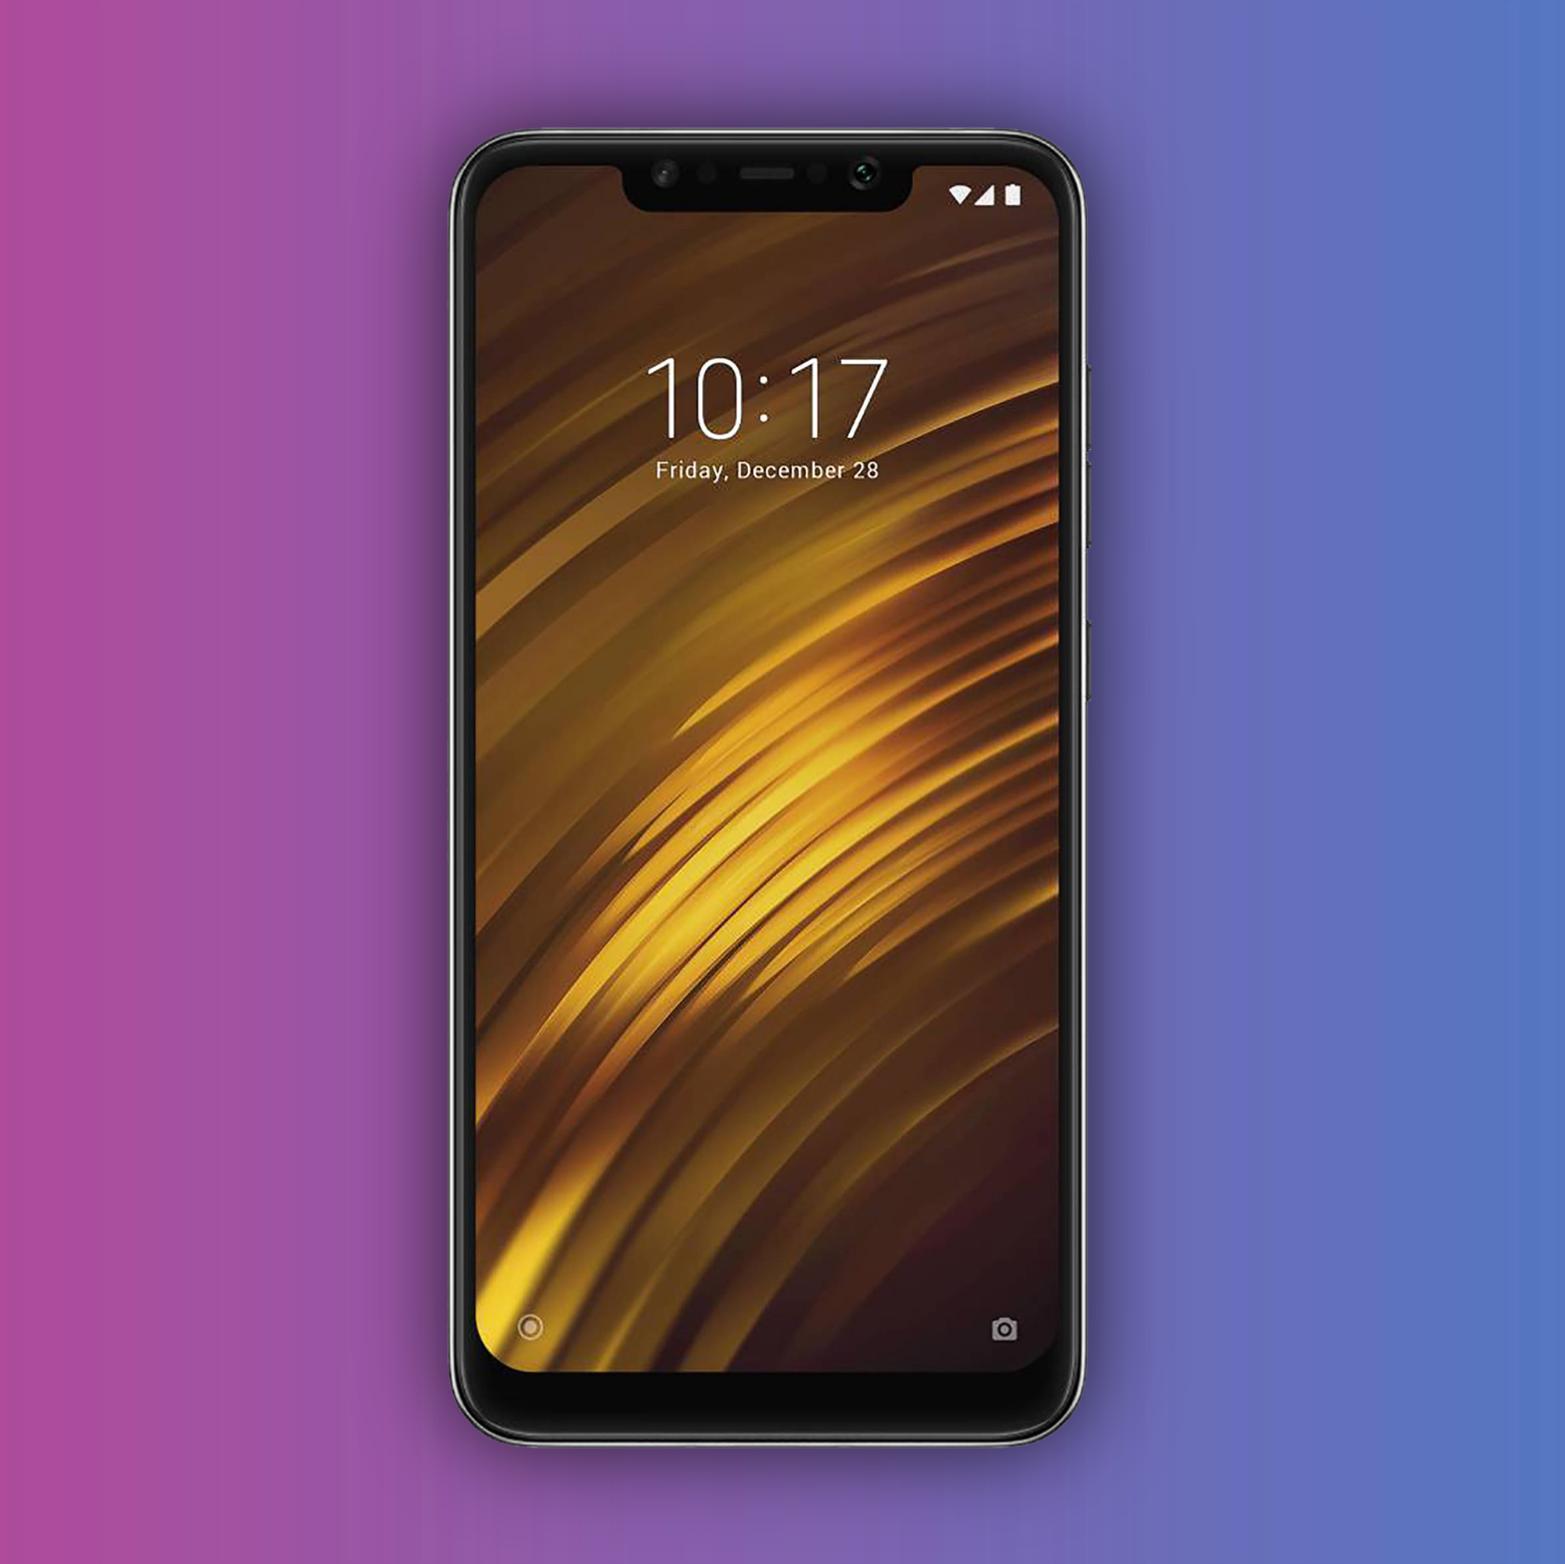 Xiaomi Pocophone F1 64/4GB - Snapdragon 845 - 4000mAh Akku | Europäischer Händler